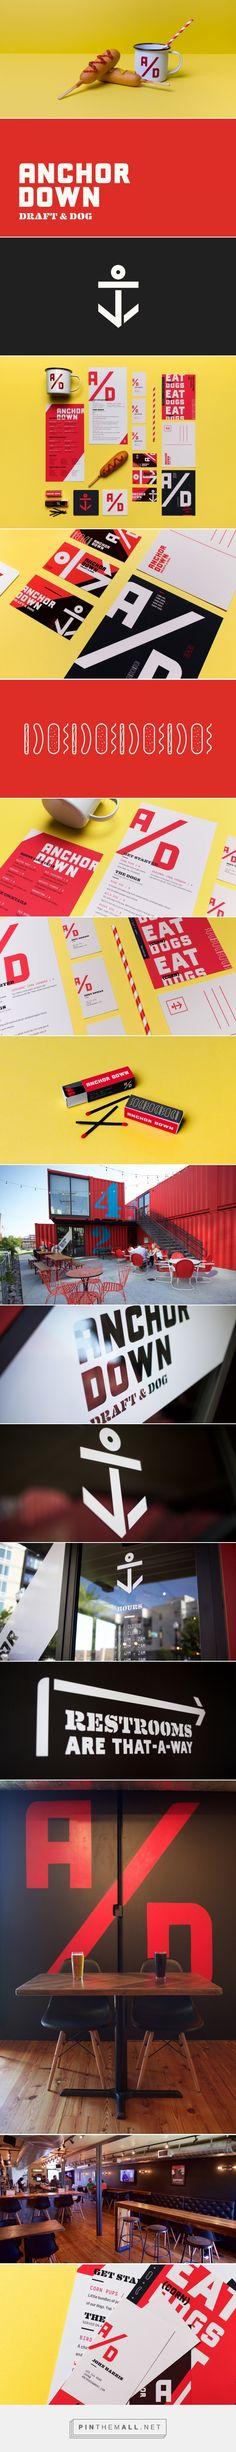 Anchor Down Restaurant Branding by Mast | Fivestar Branding – Design and Branding Agency & Inspiration Gallery